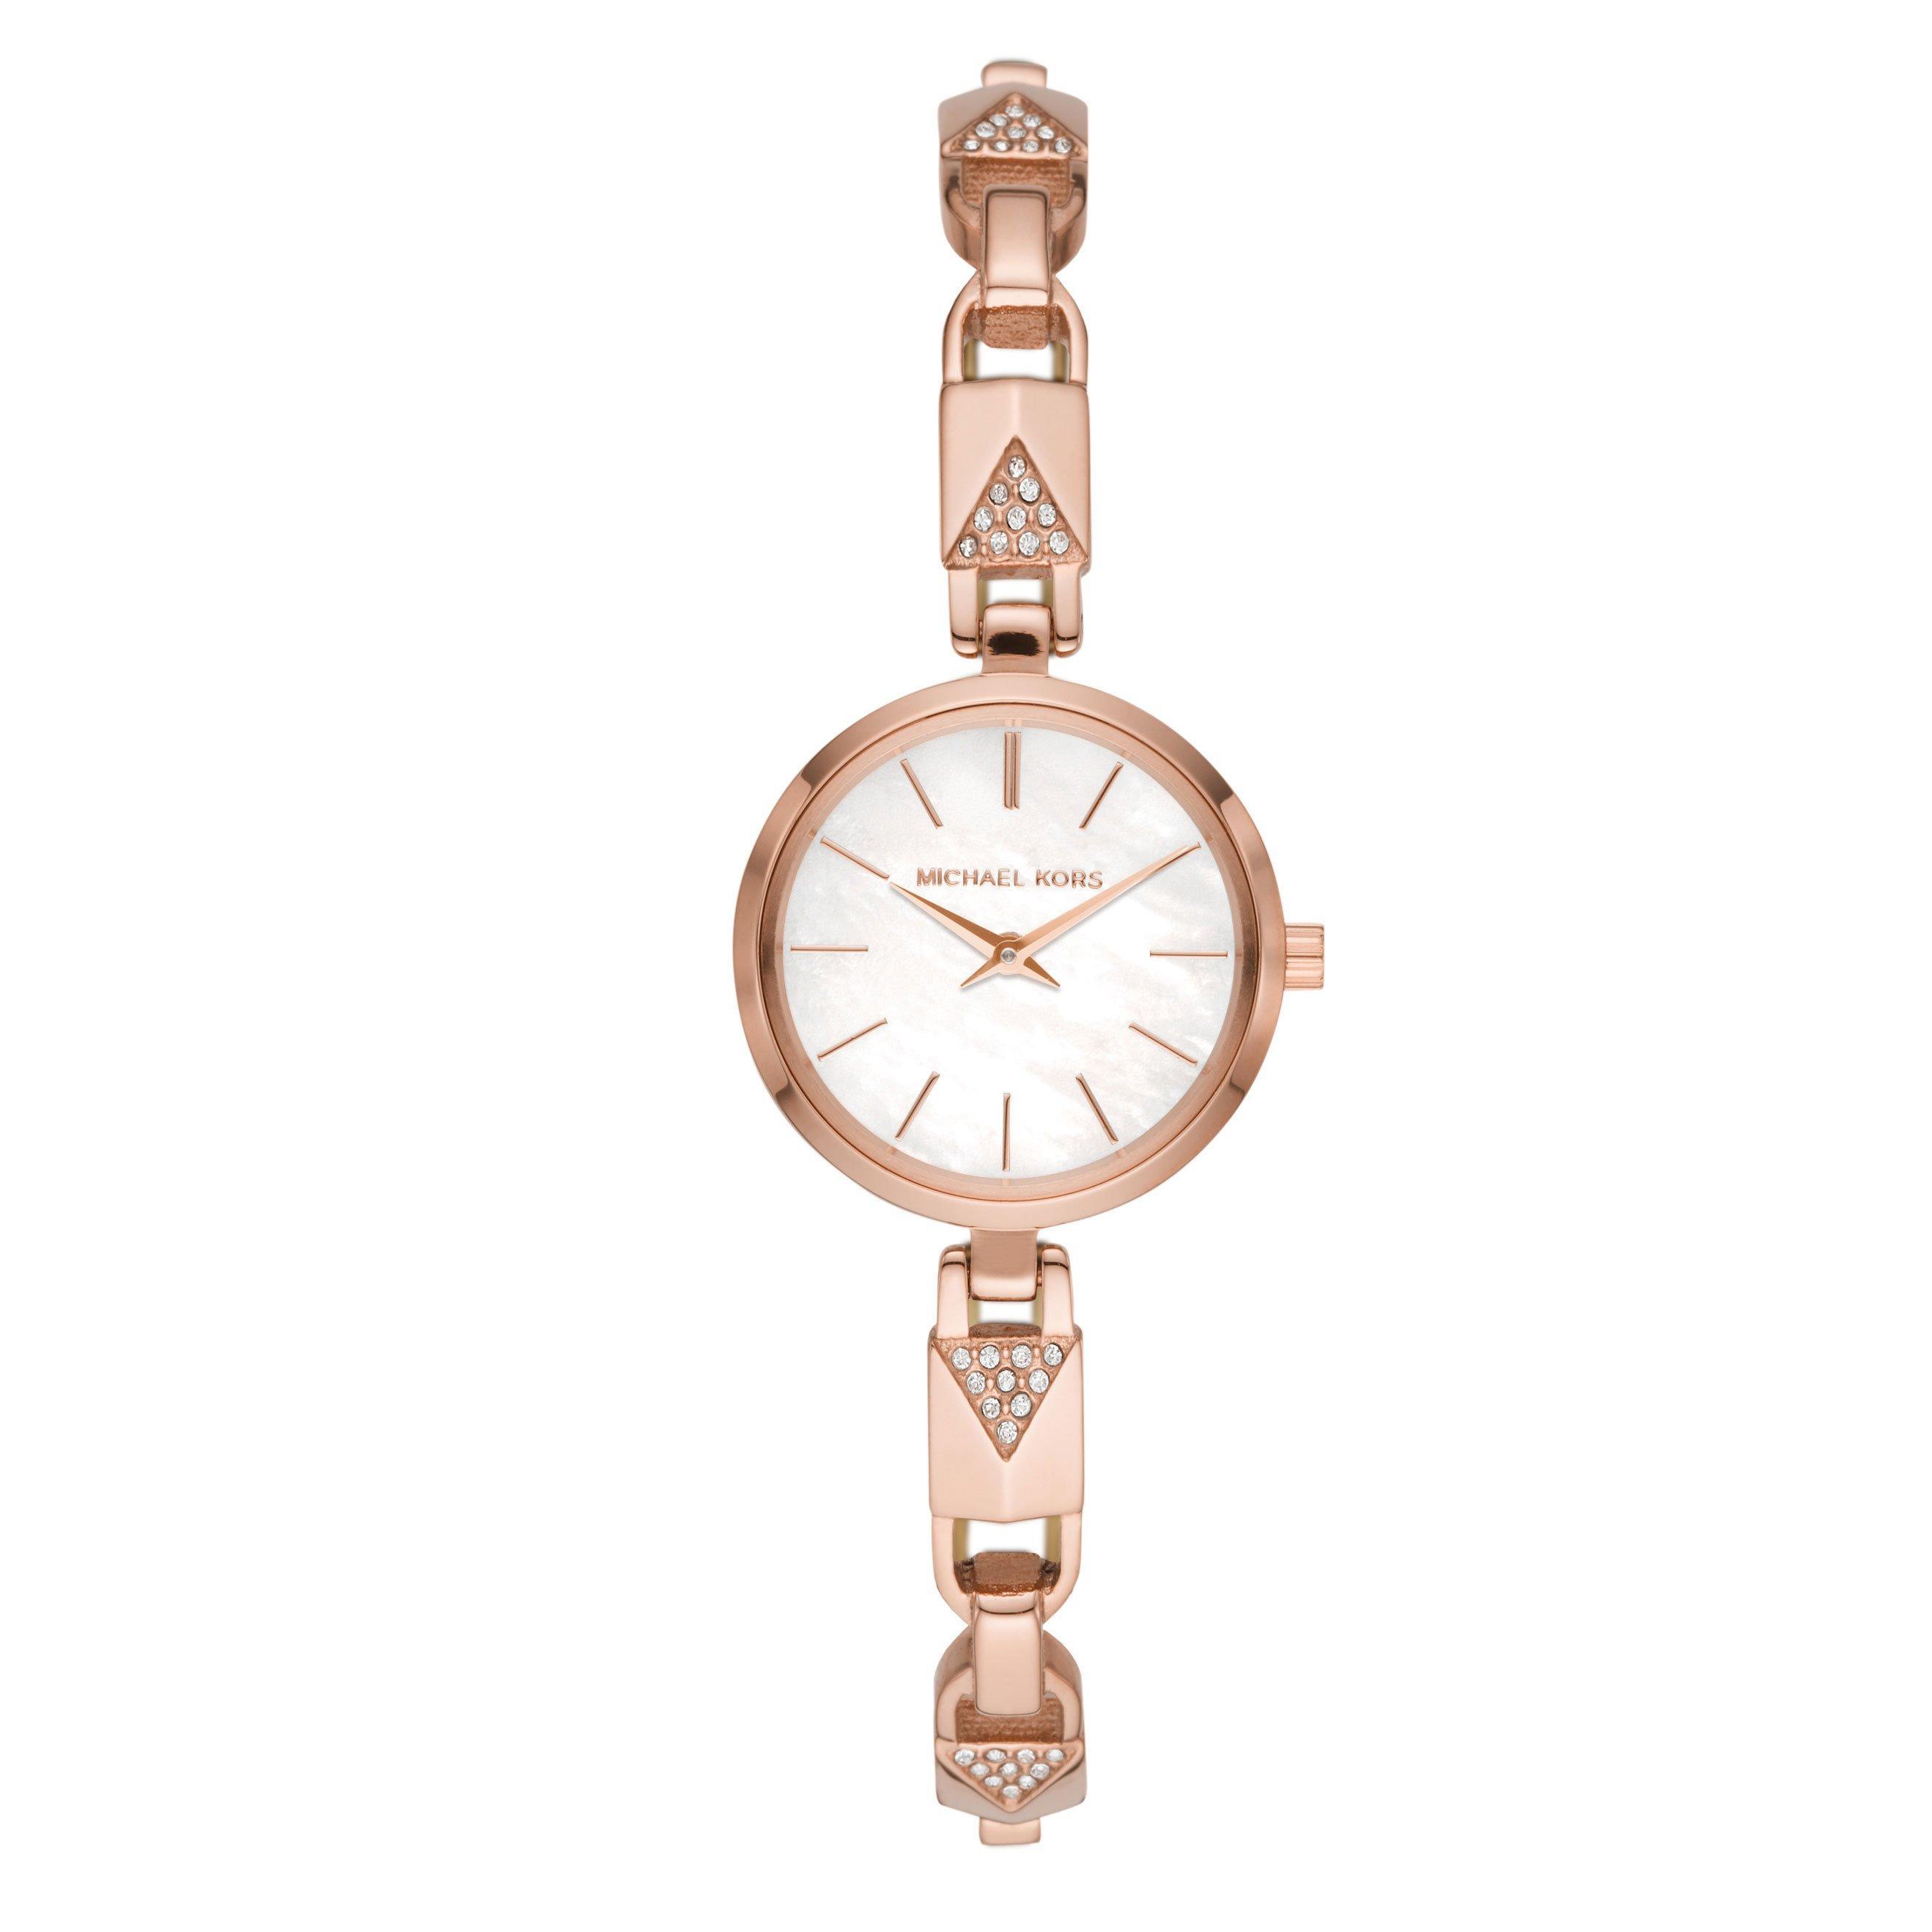 Michael Kors Jayrn Mercer Rose Gold Plated Ladies Watch